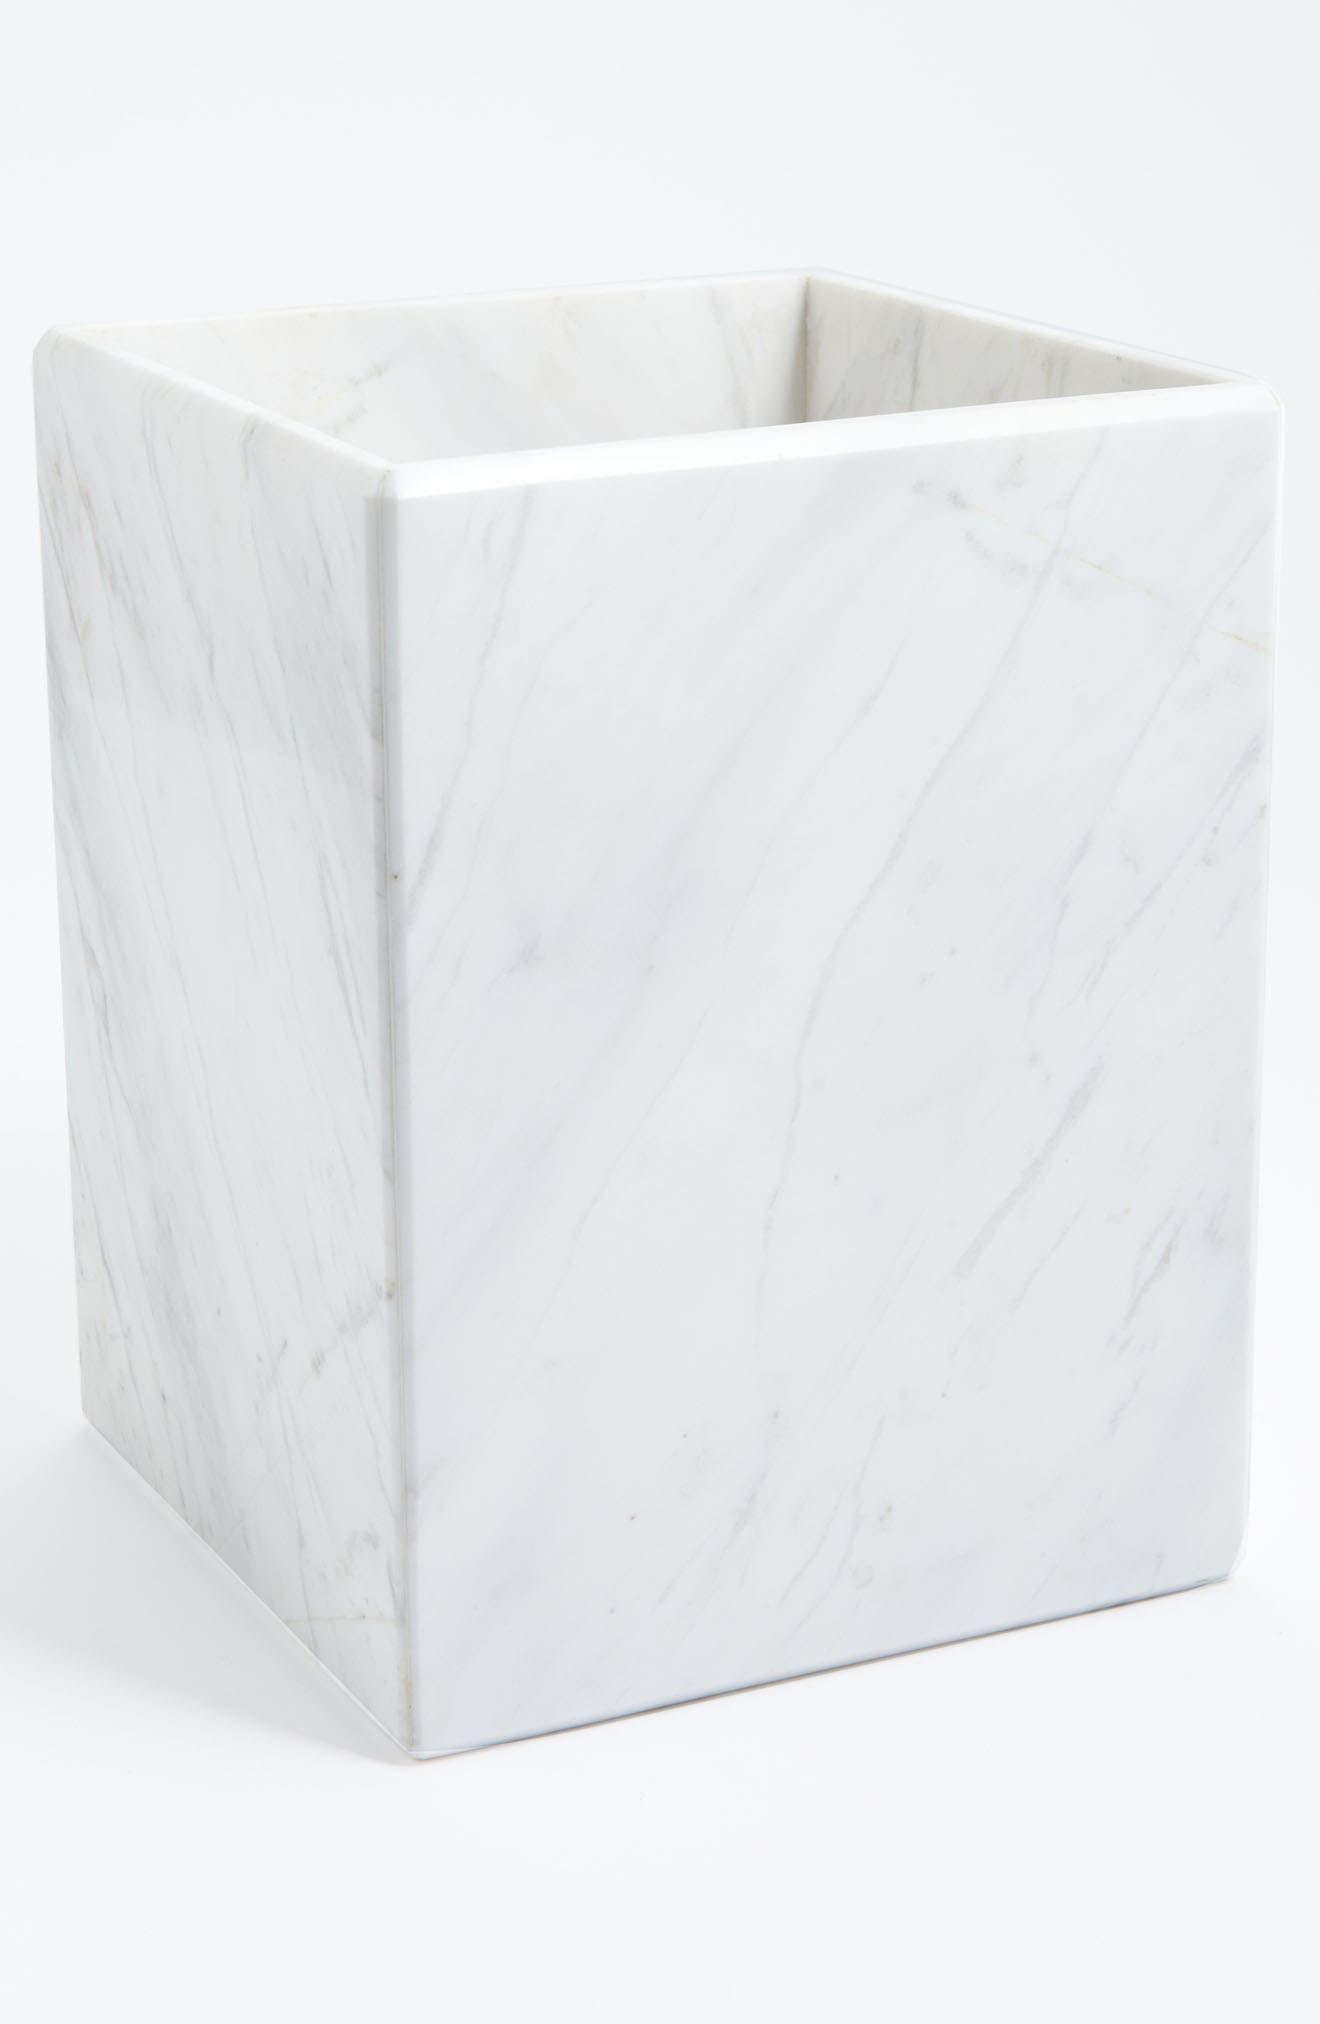 Studio 'Luna' White Marble Wastebasket,                         Main,                         color, White